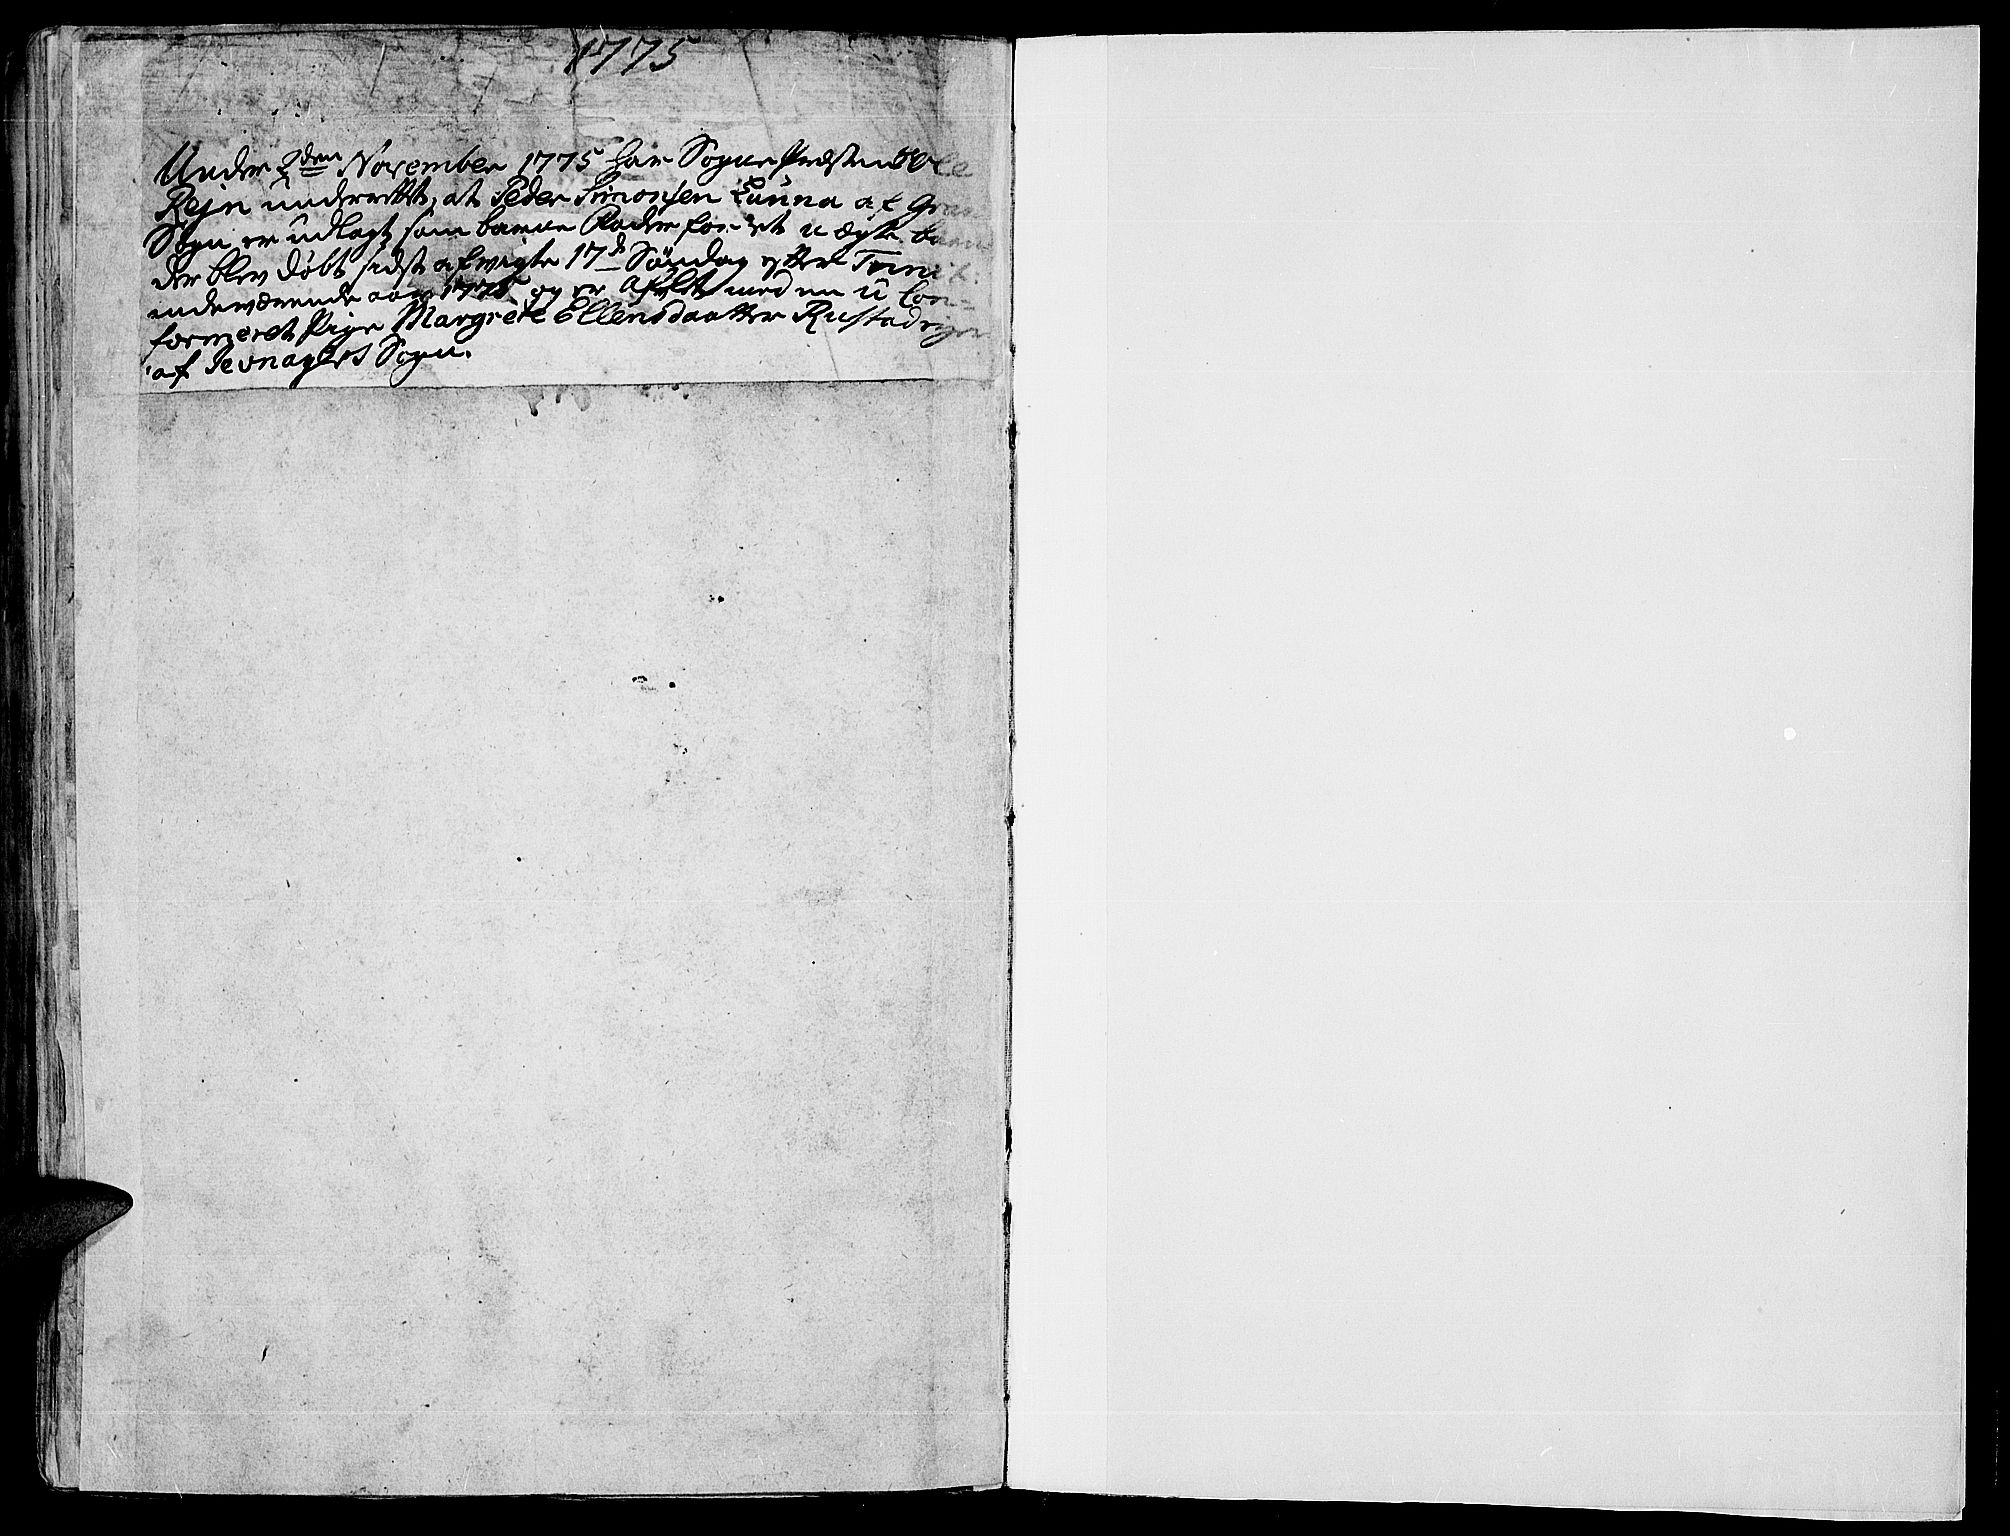 SAH, Gran prestekontor, Ministerialbok nr. 4, 1759-1775, s. 278